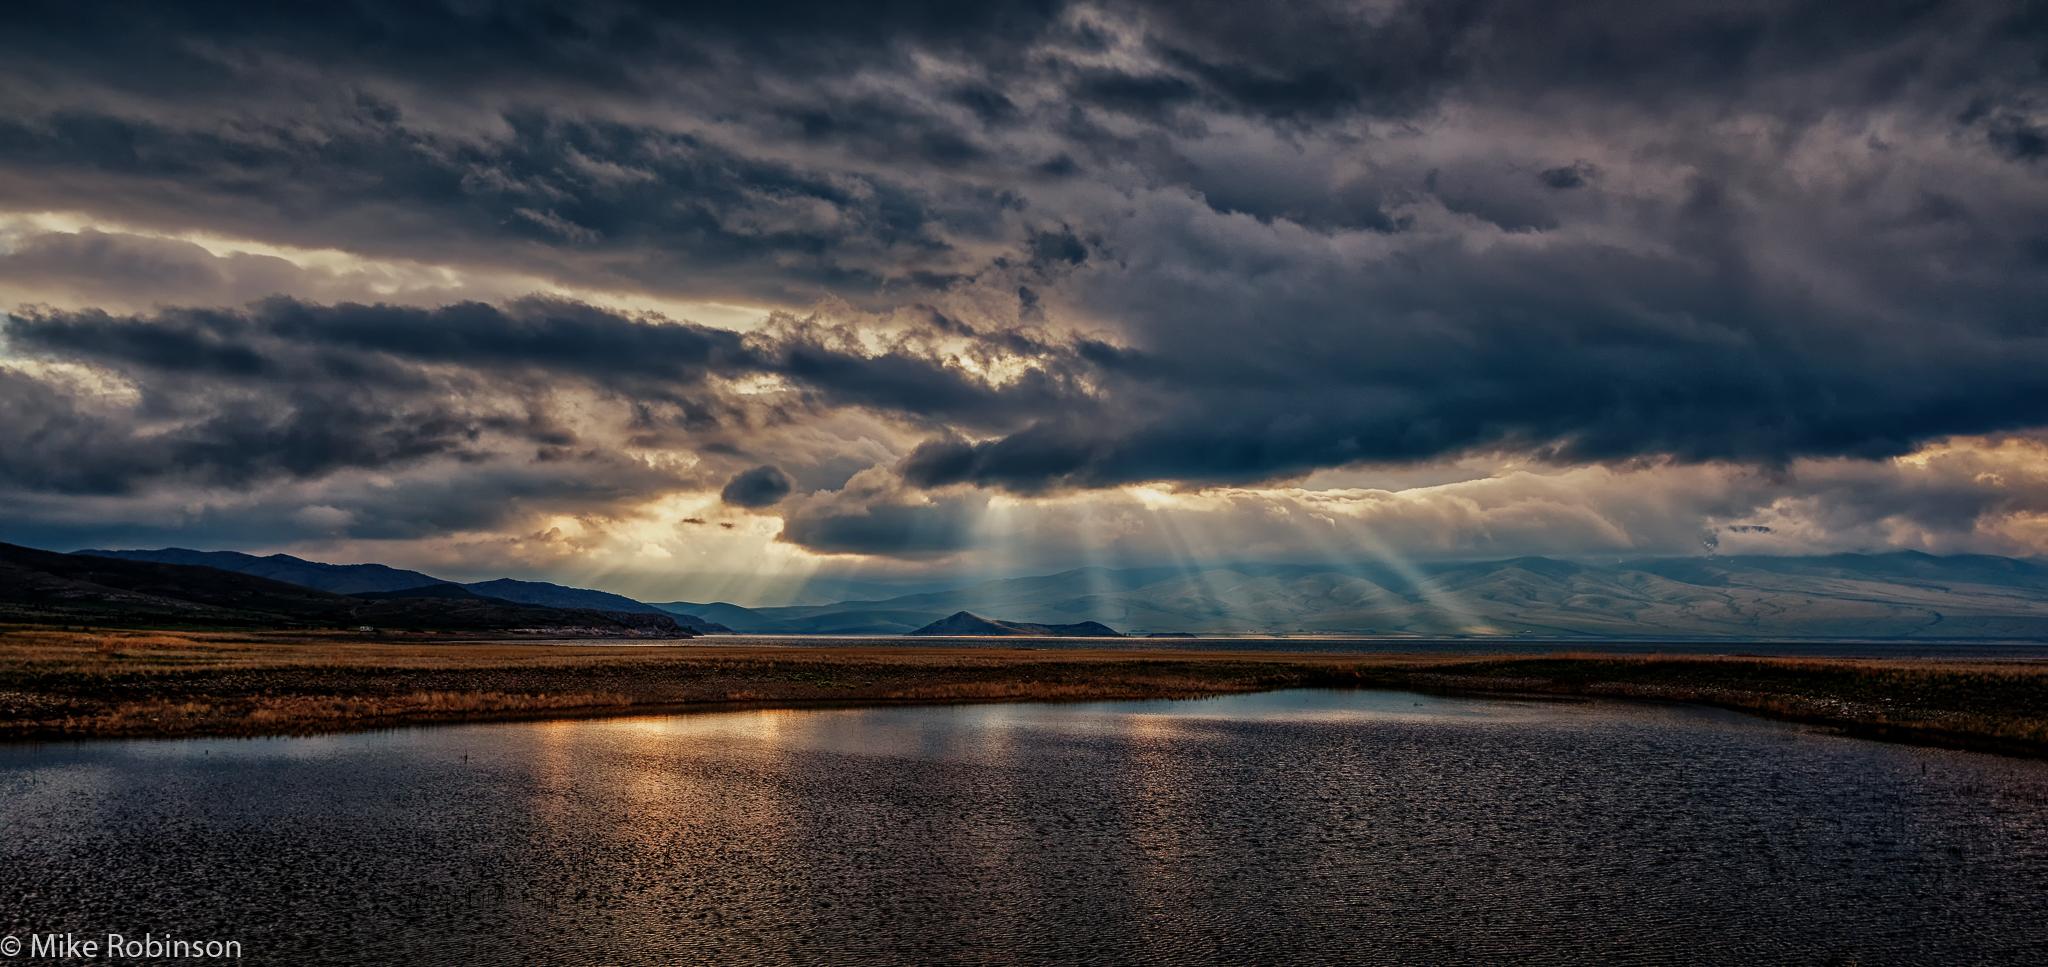 Clark_Canyon_Reservoir_4_HDR